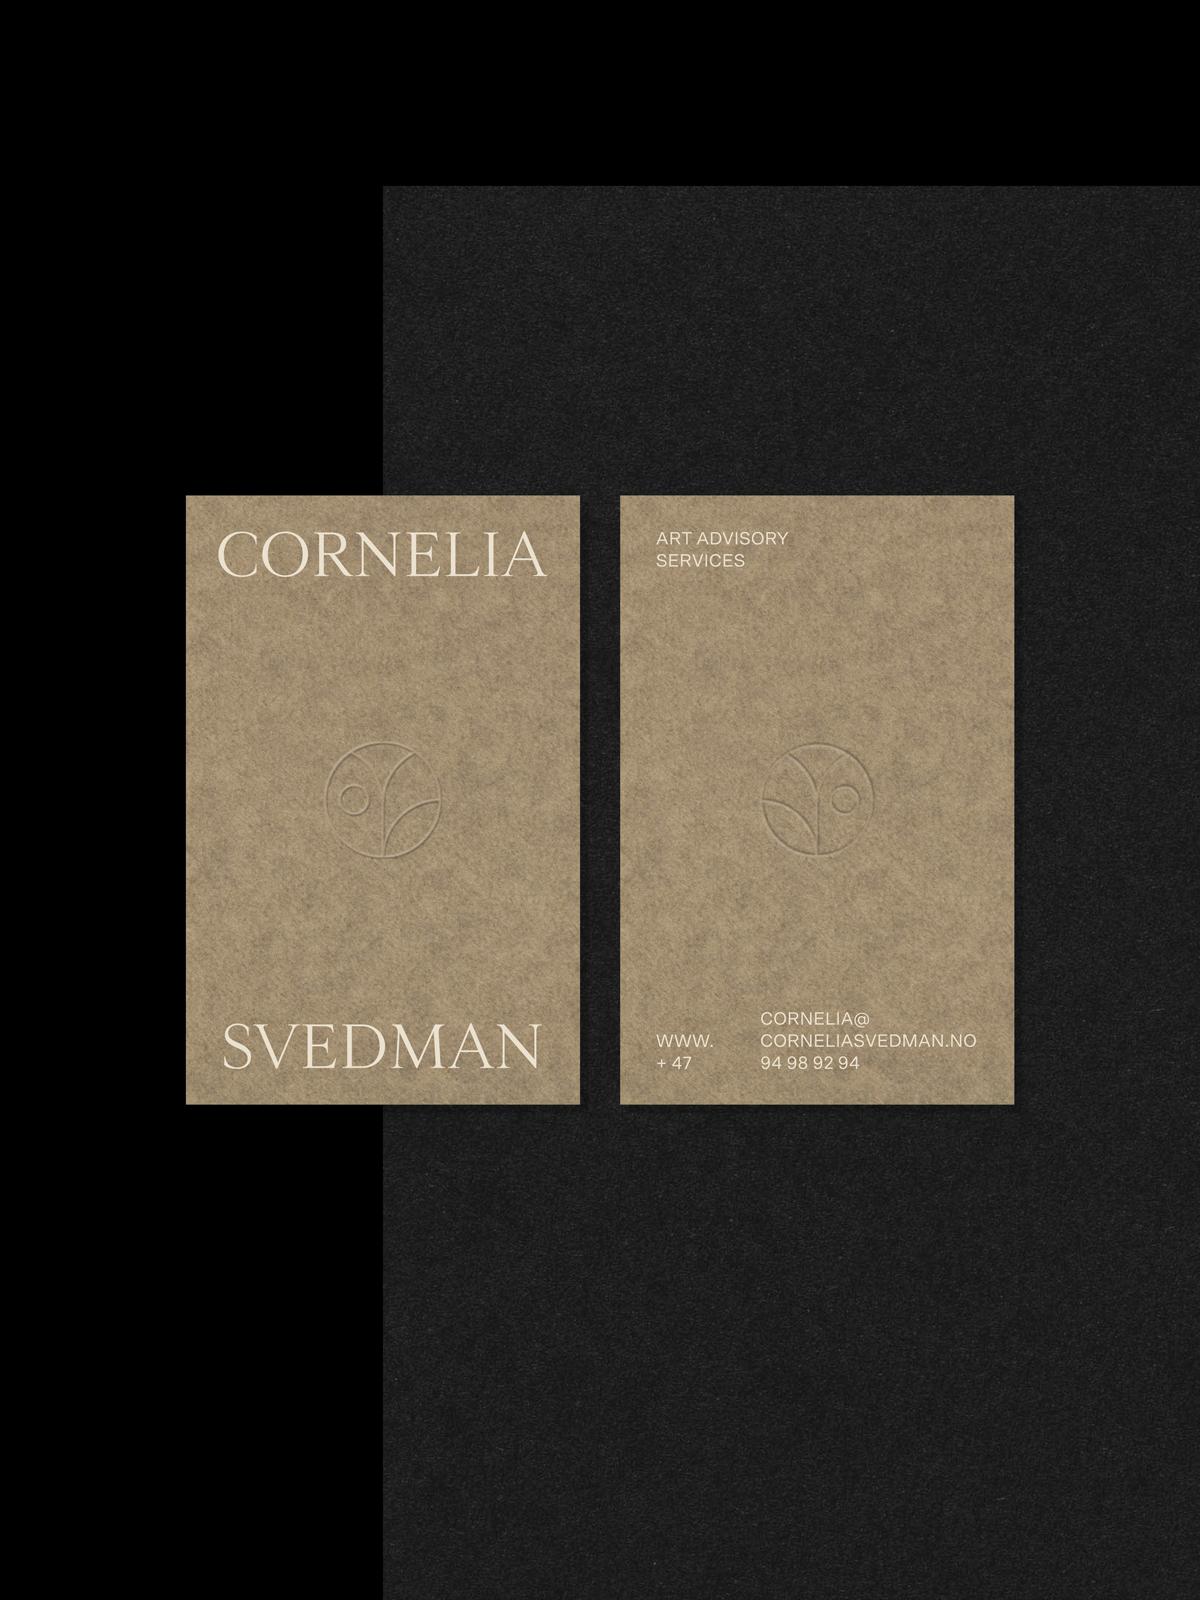 CorneliaSvedman_Cards